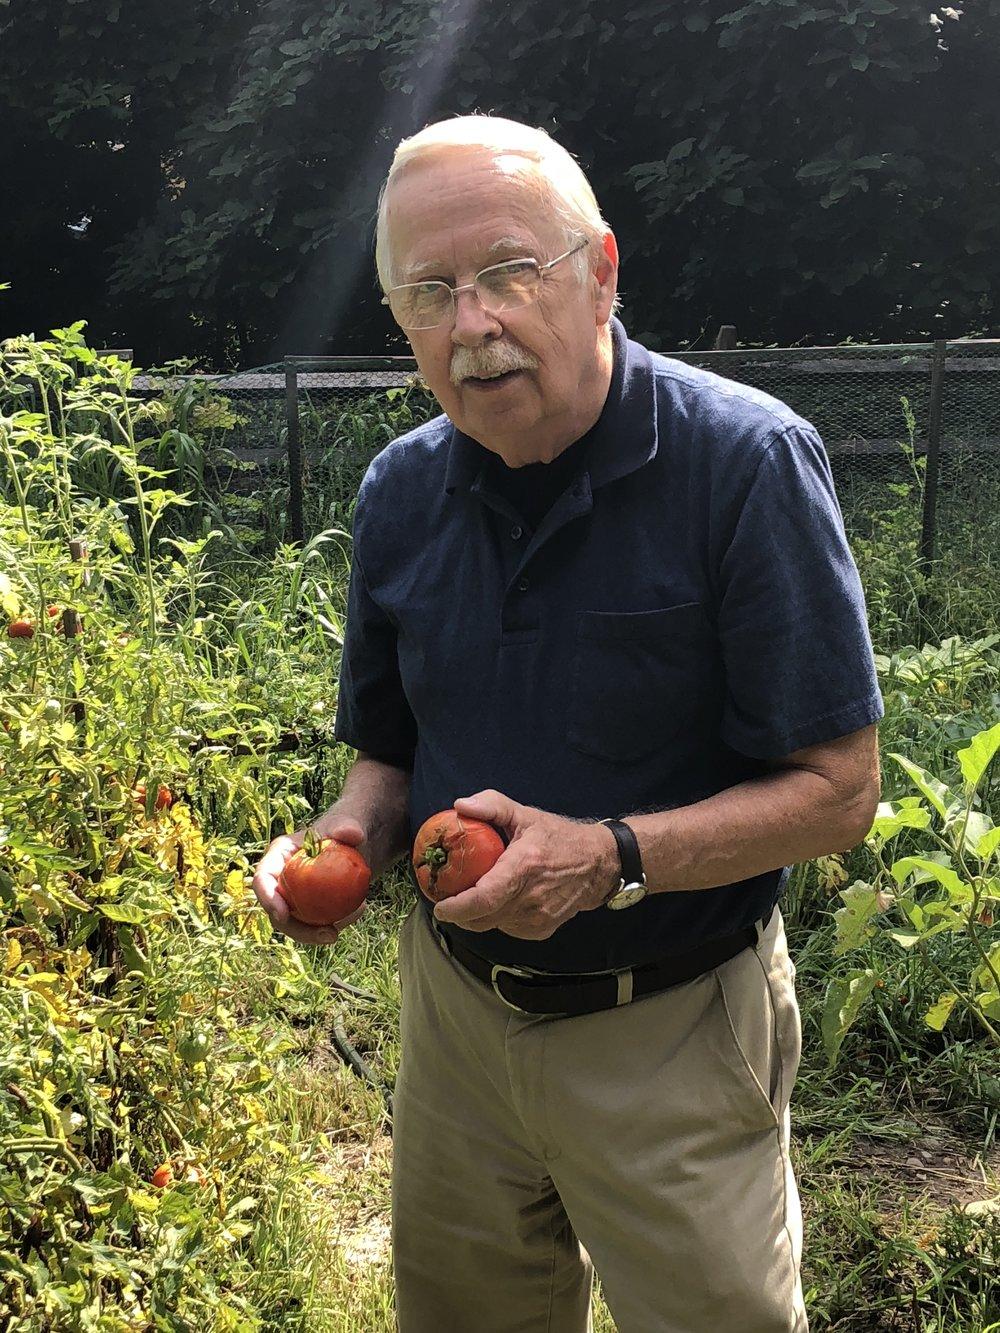 Fred w tomato.JPG